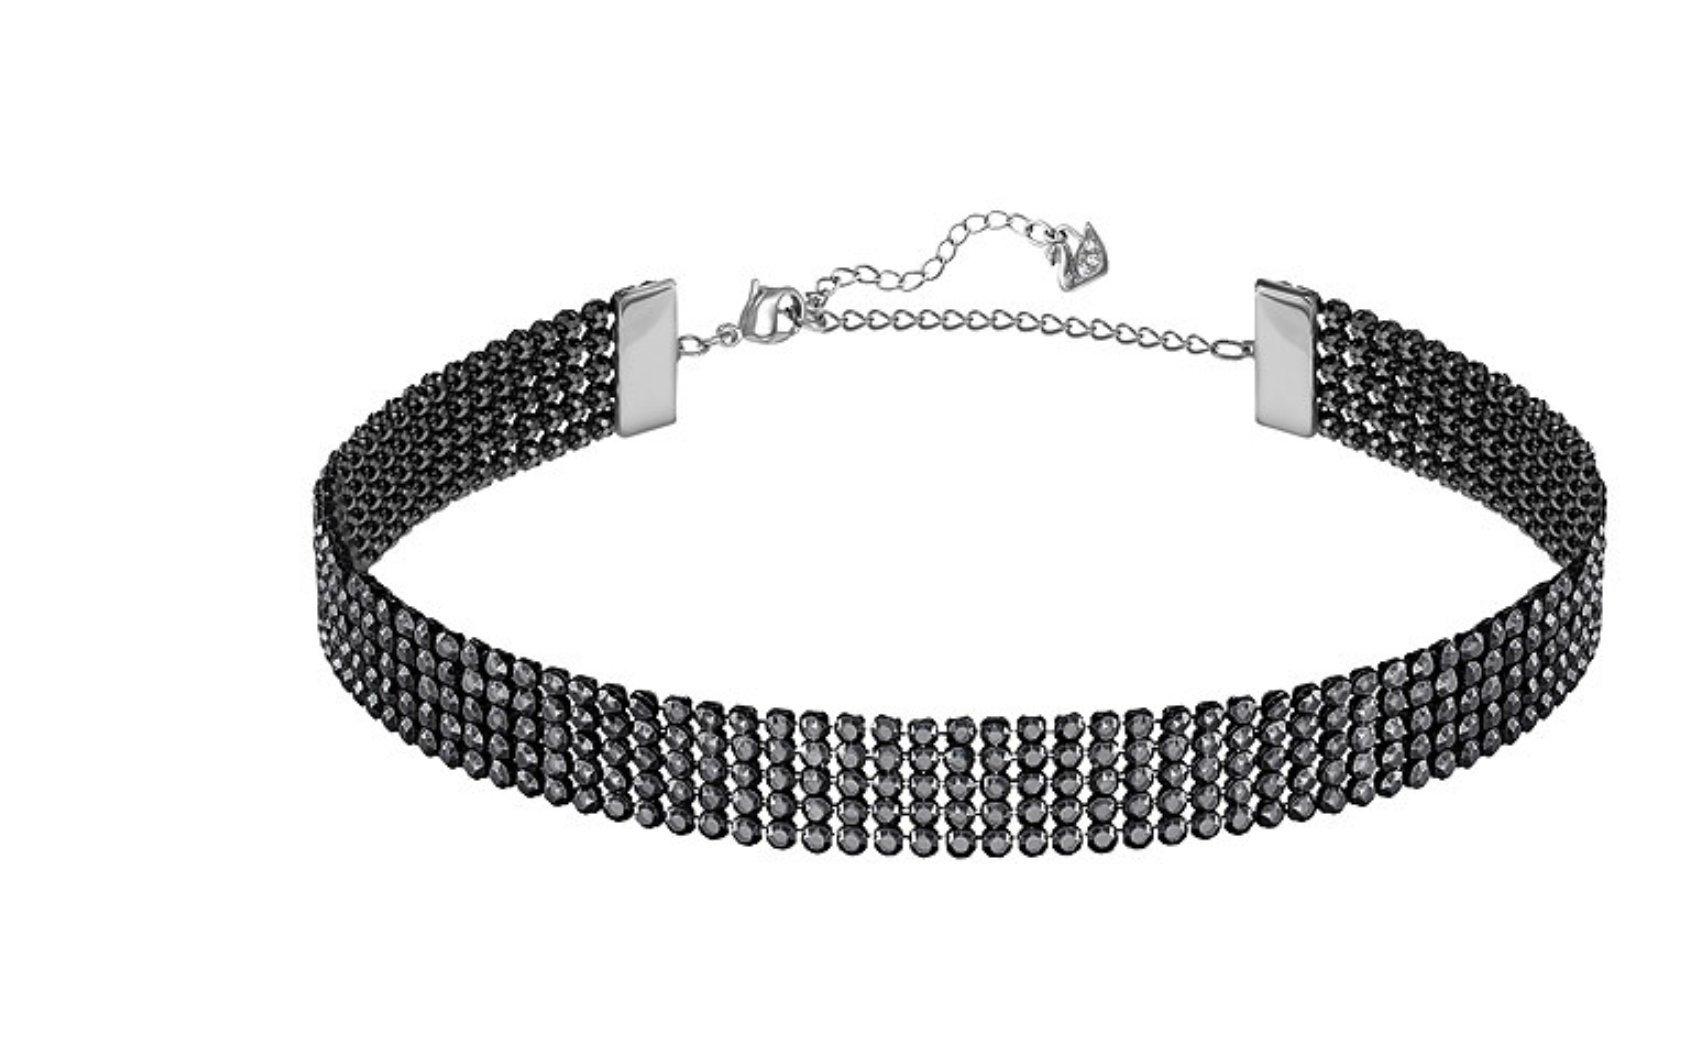 Swarovski Fit Necklace Choker, Black, Ruthenium Plating, 5355185